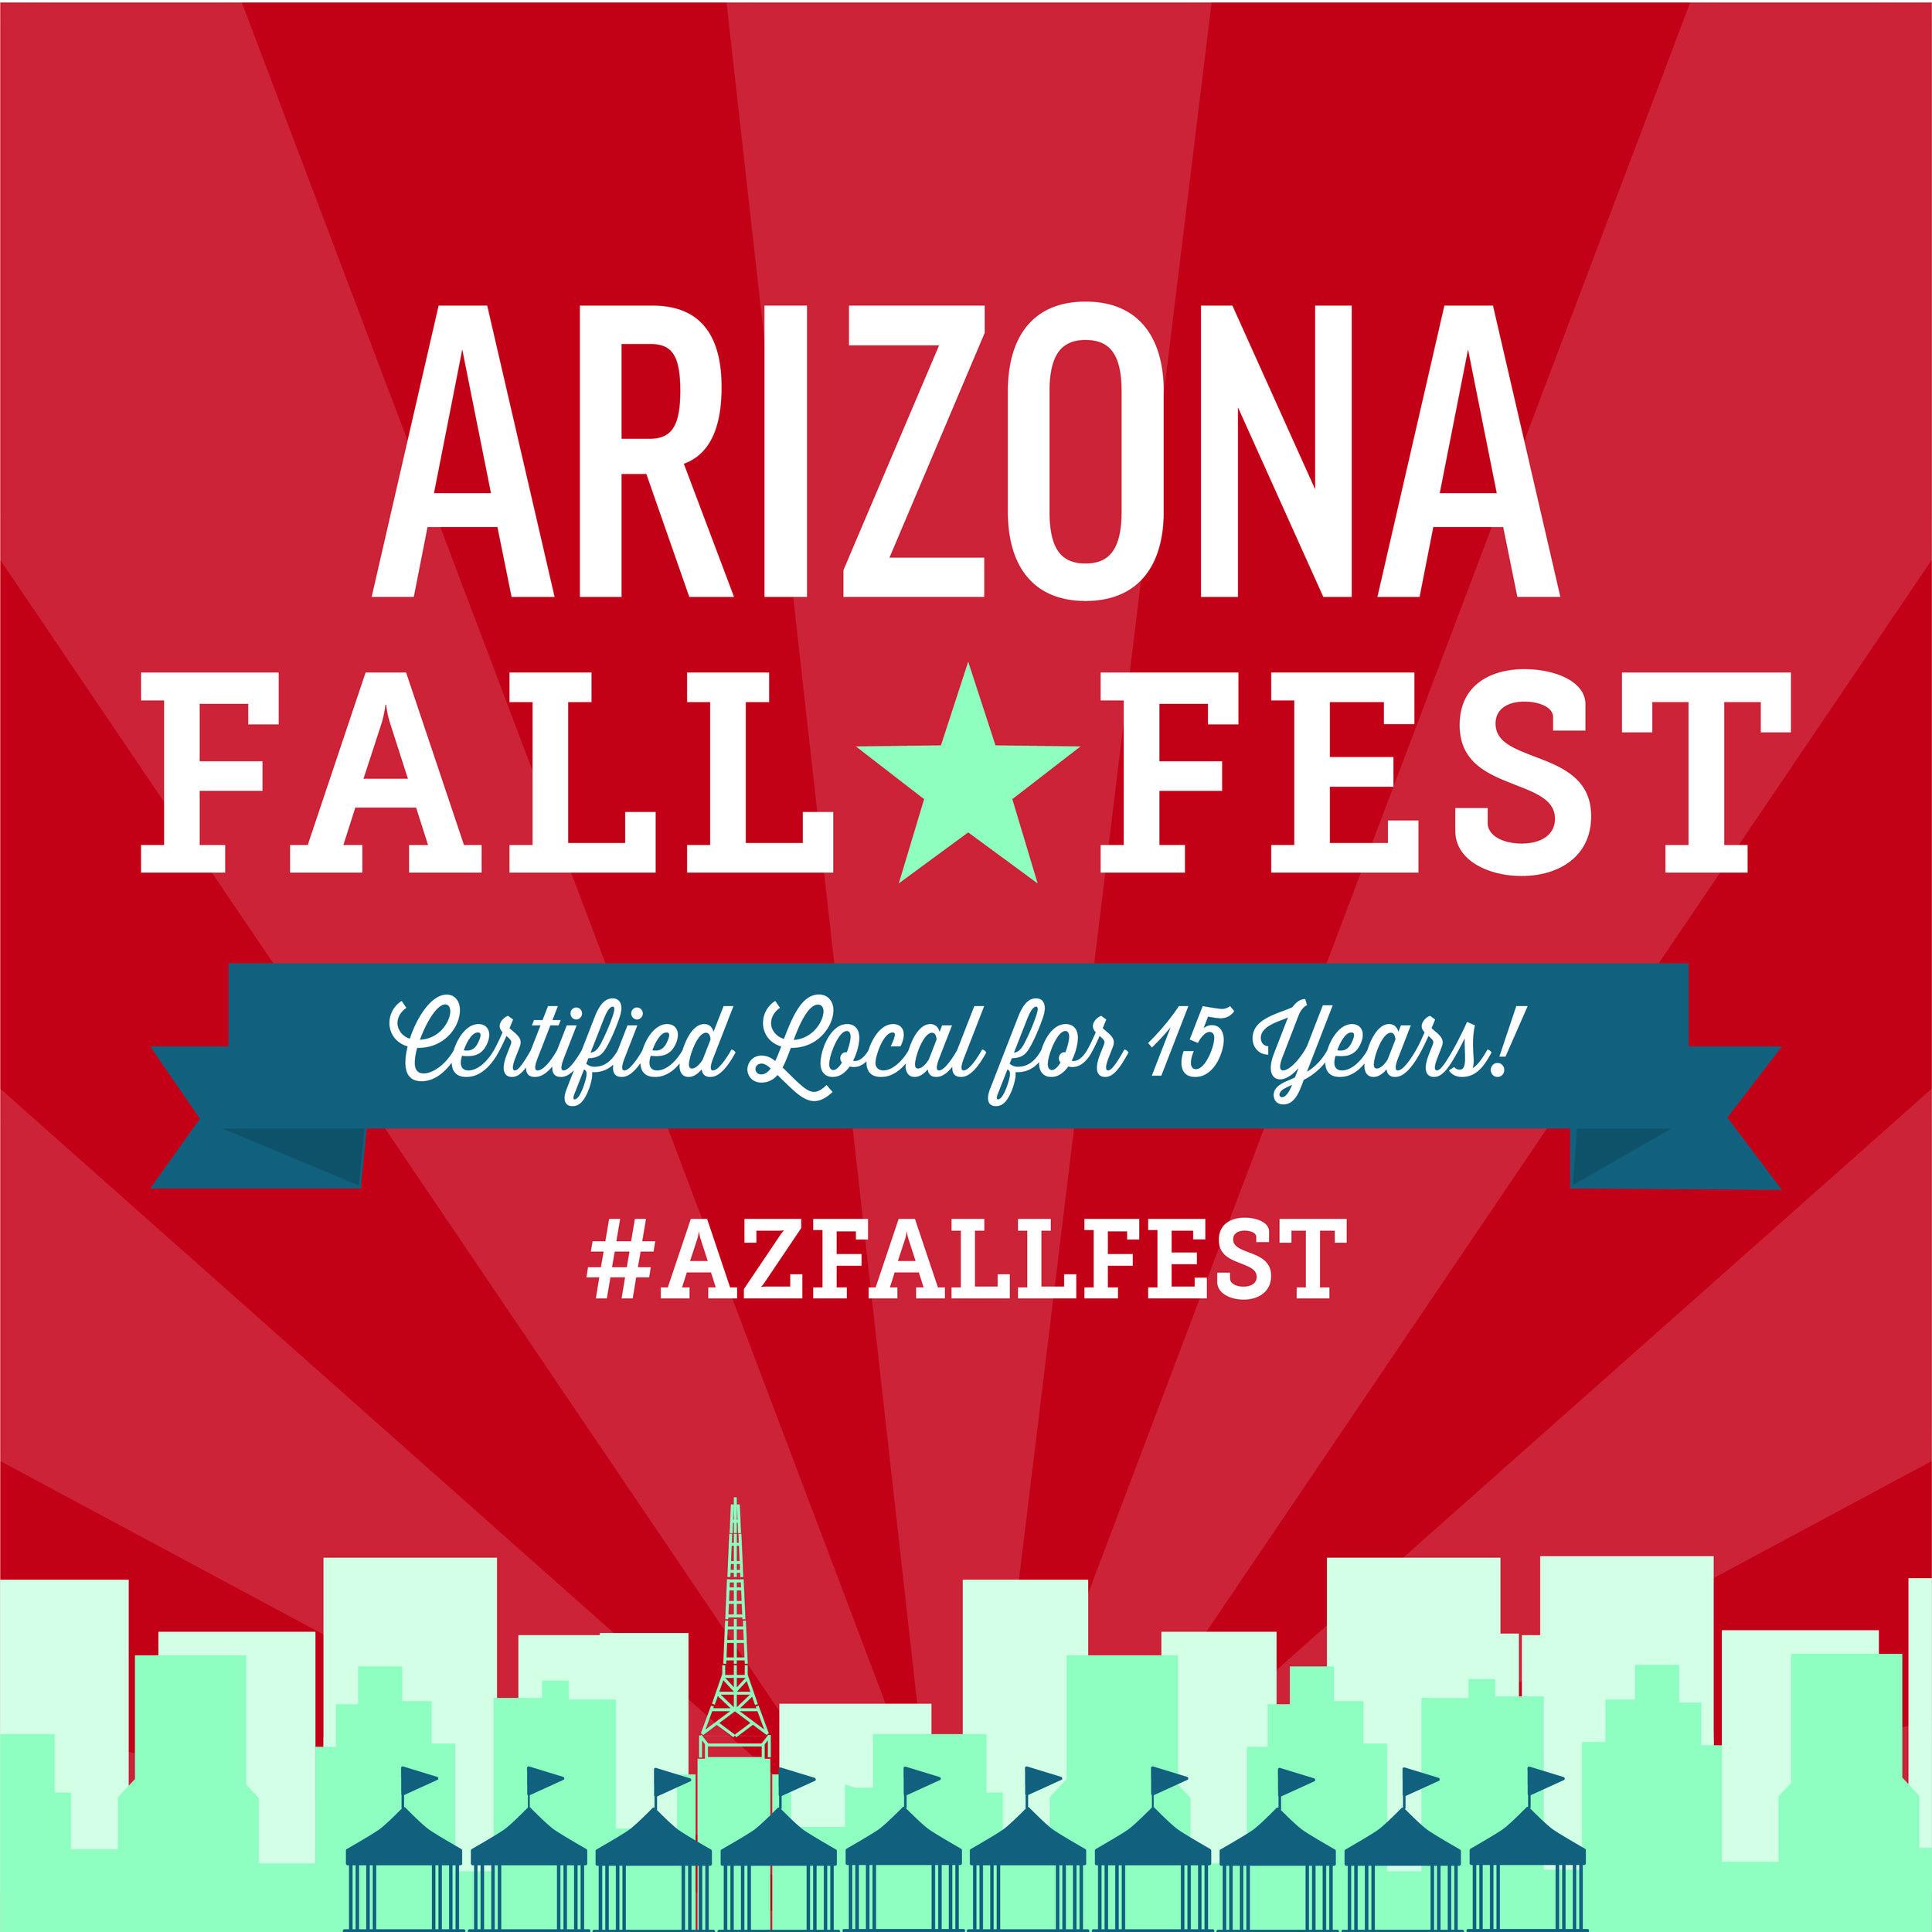 2019 AZ Fall Fest Promo Graphics Final_Facebook Image.jpg